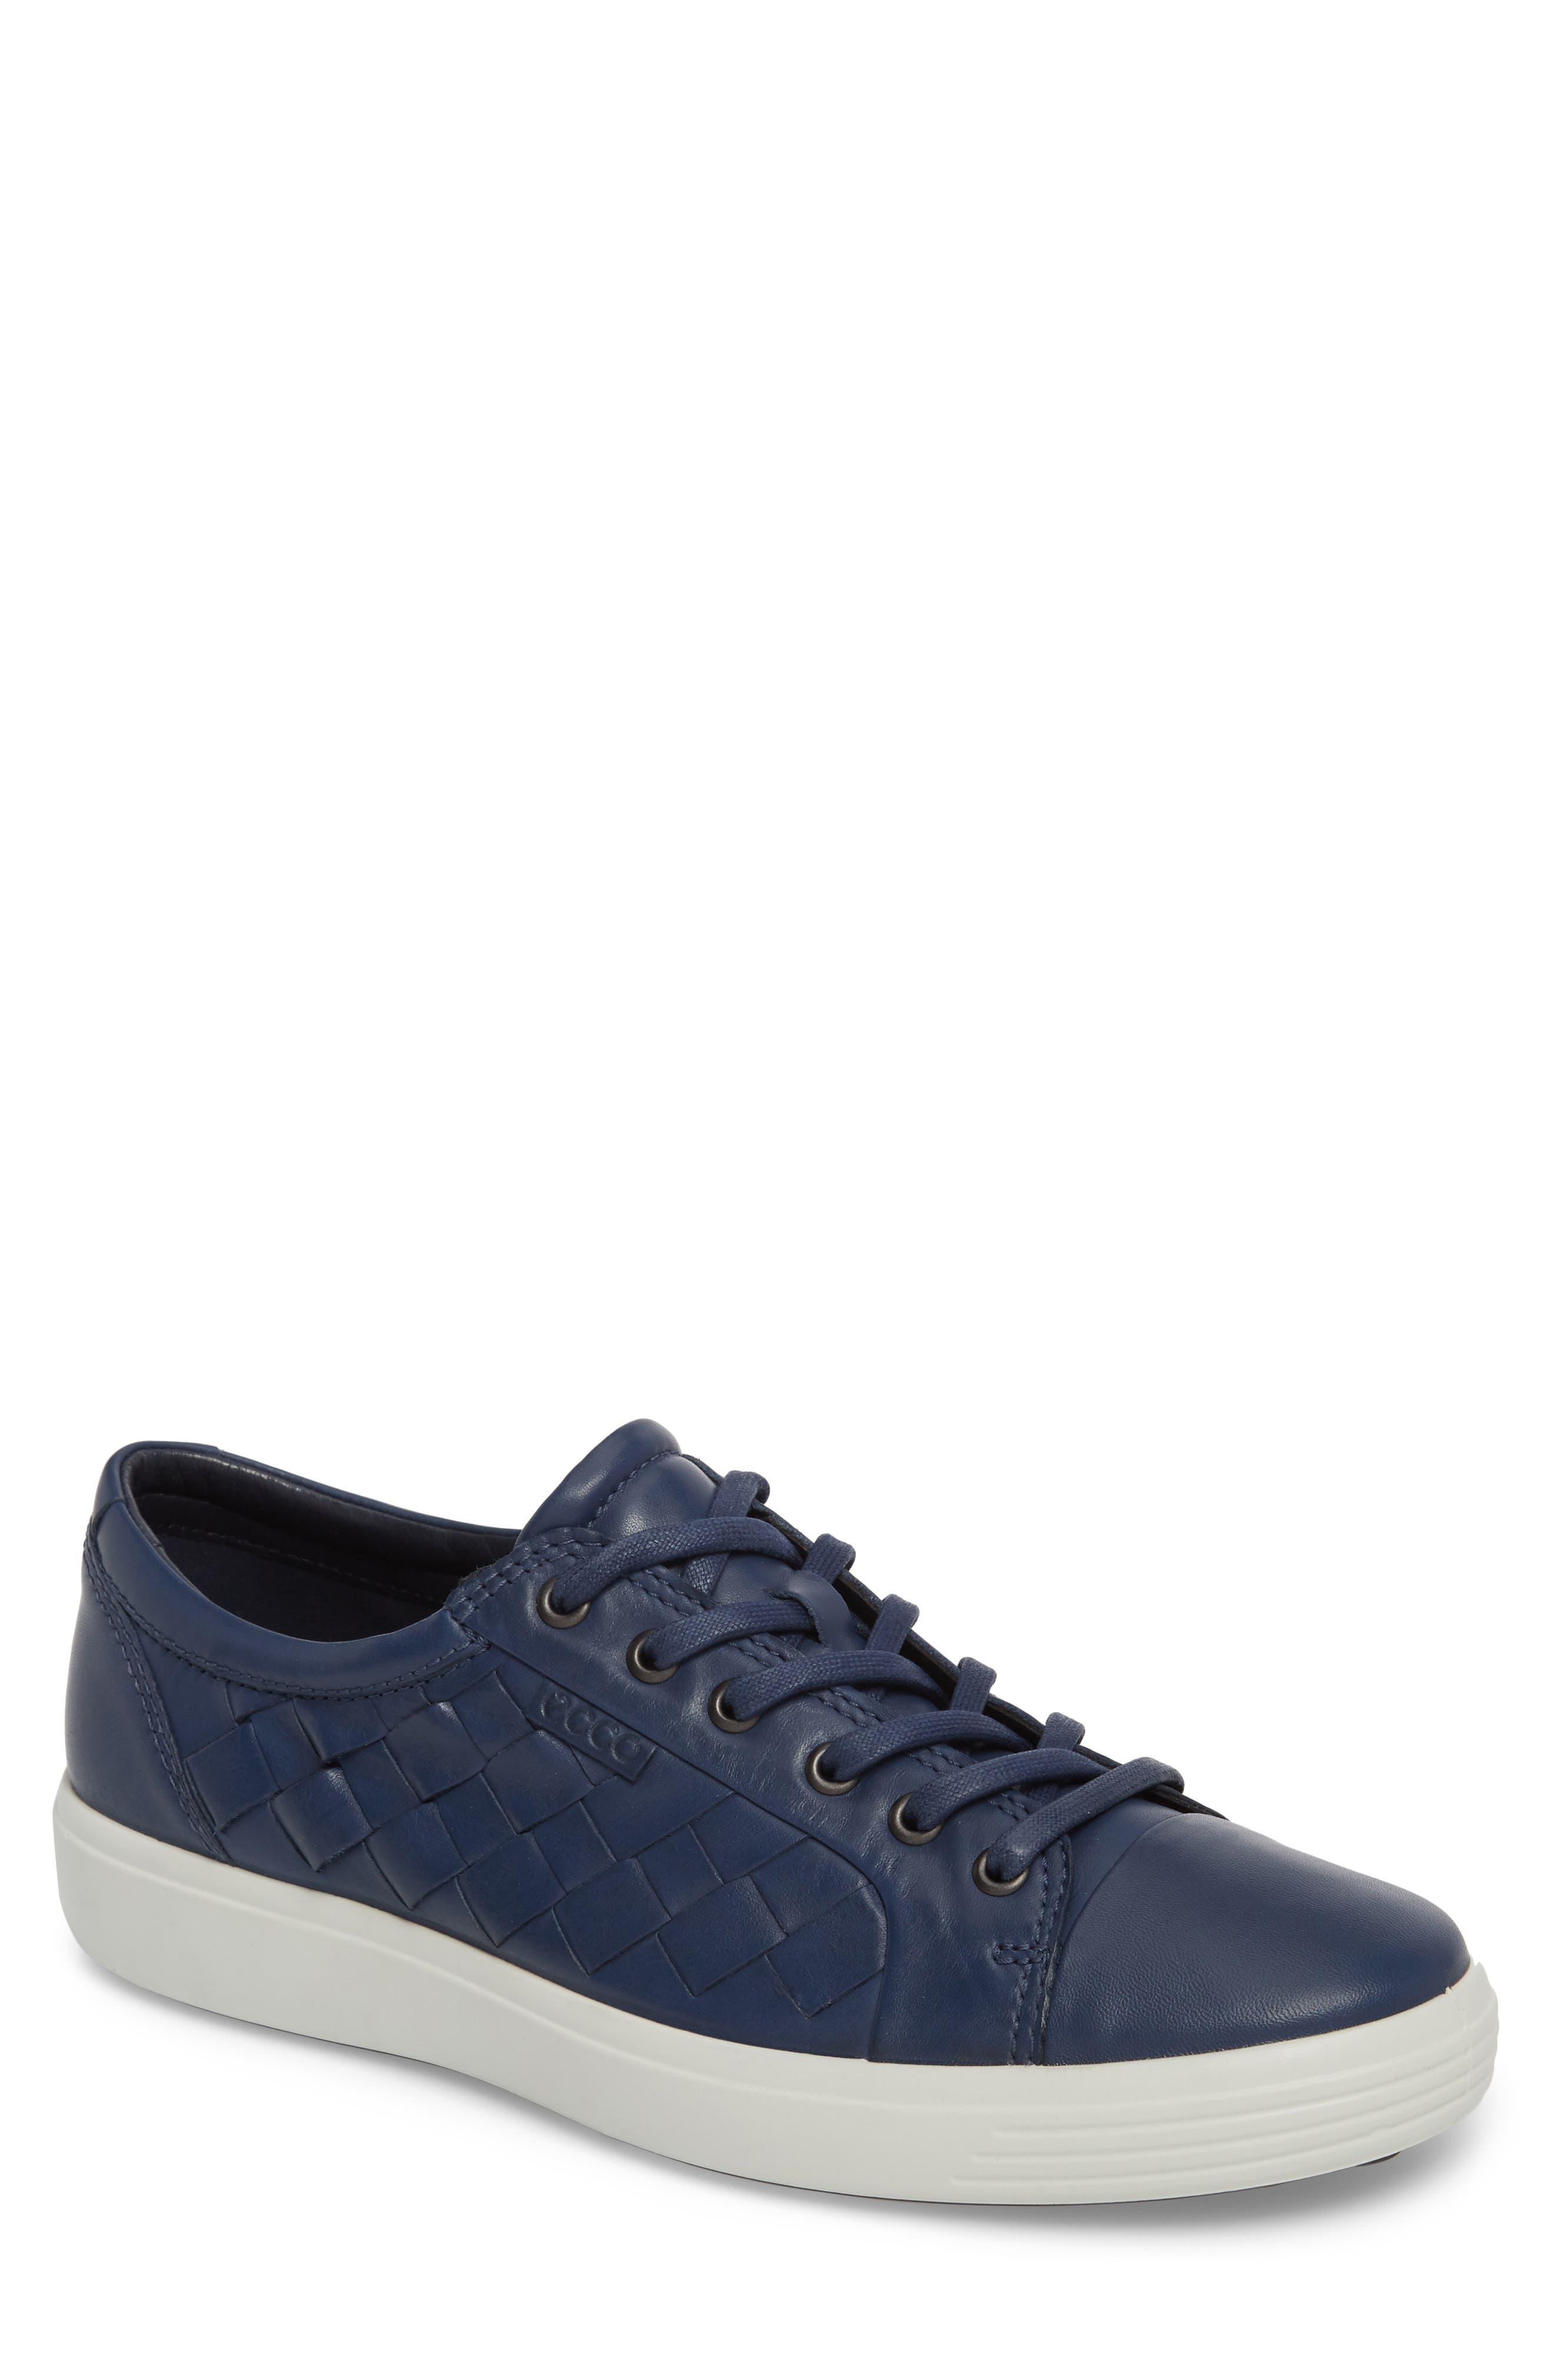 Ecco Soft 7 Woven Sneaker - Blue